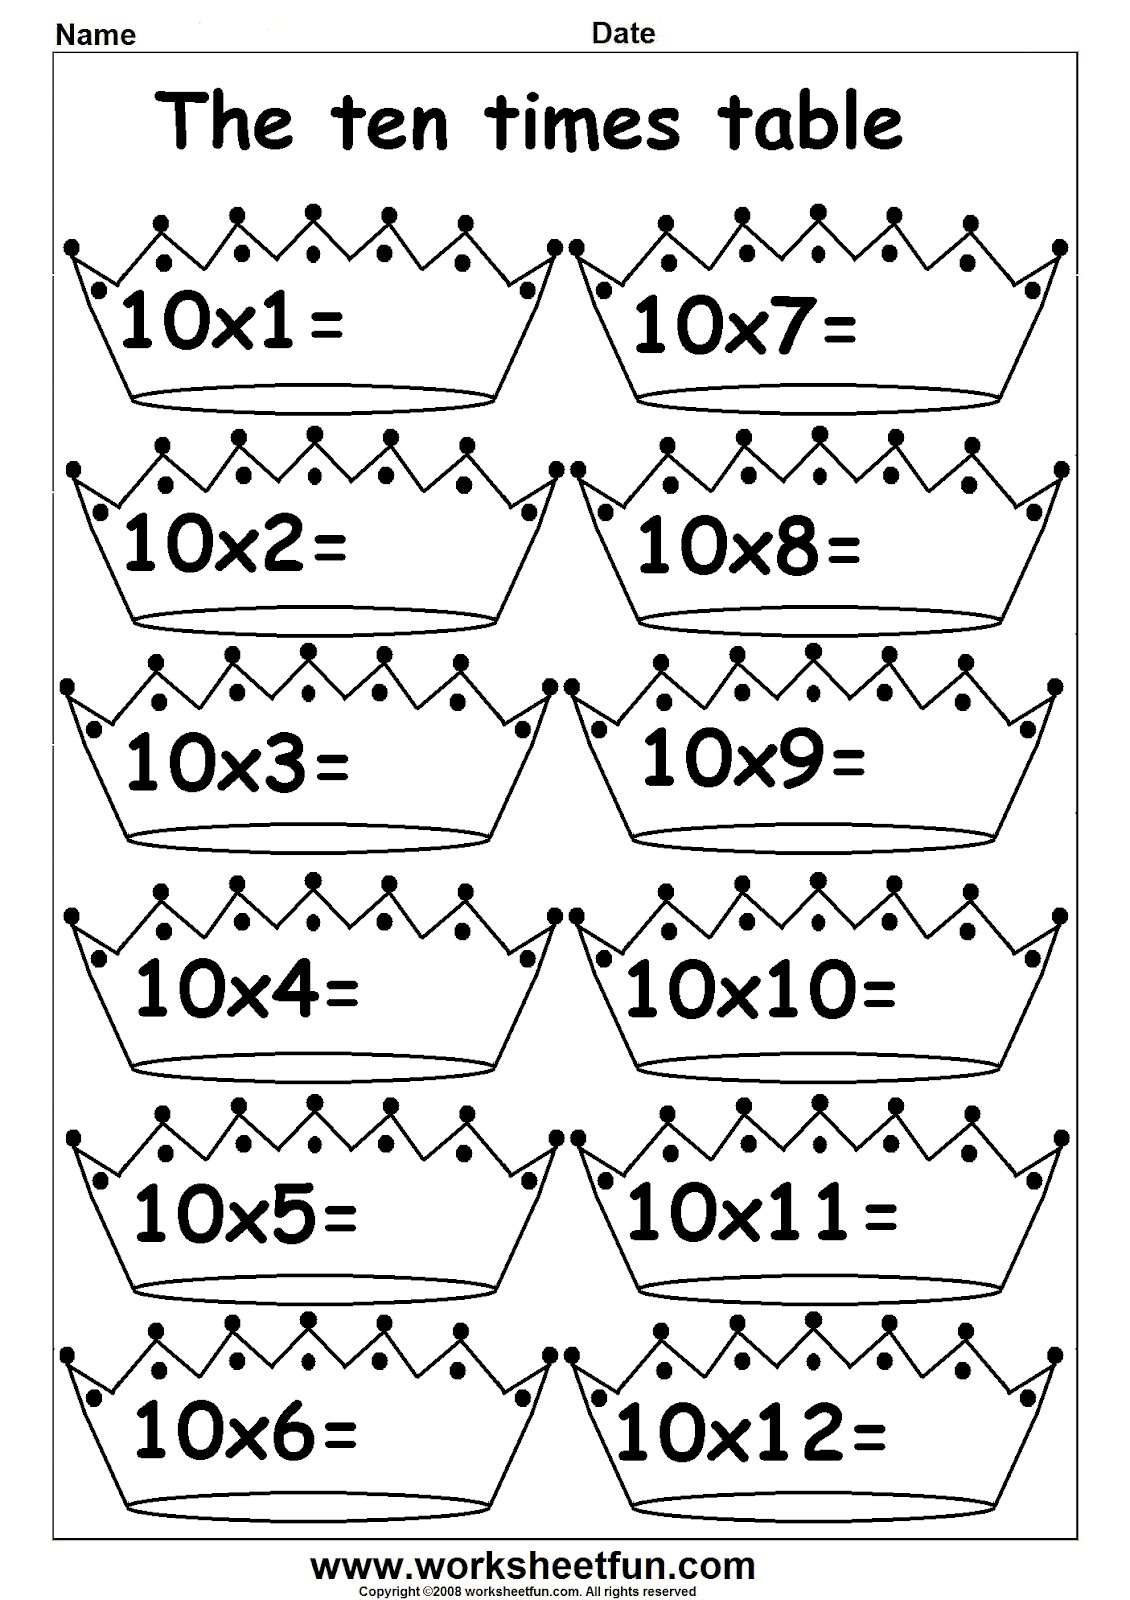 arab unity school grade 1 c blog maths multiply by 10 worksheets. Black Bedroom Furniture Sets. Home Design Ideas